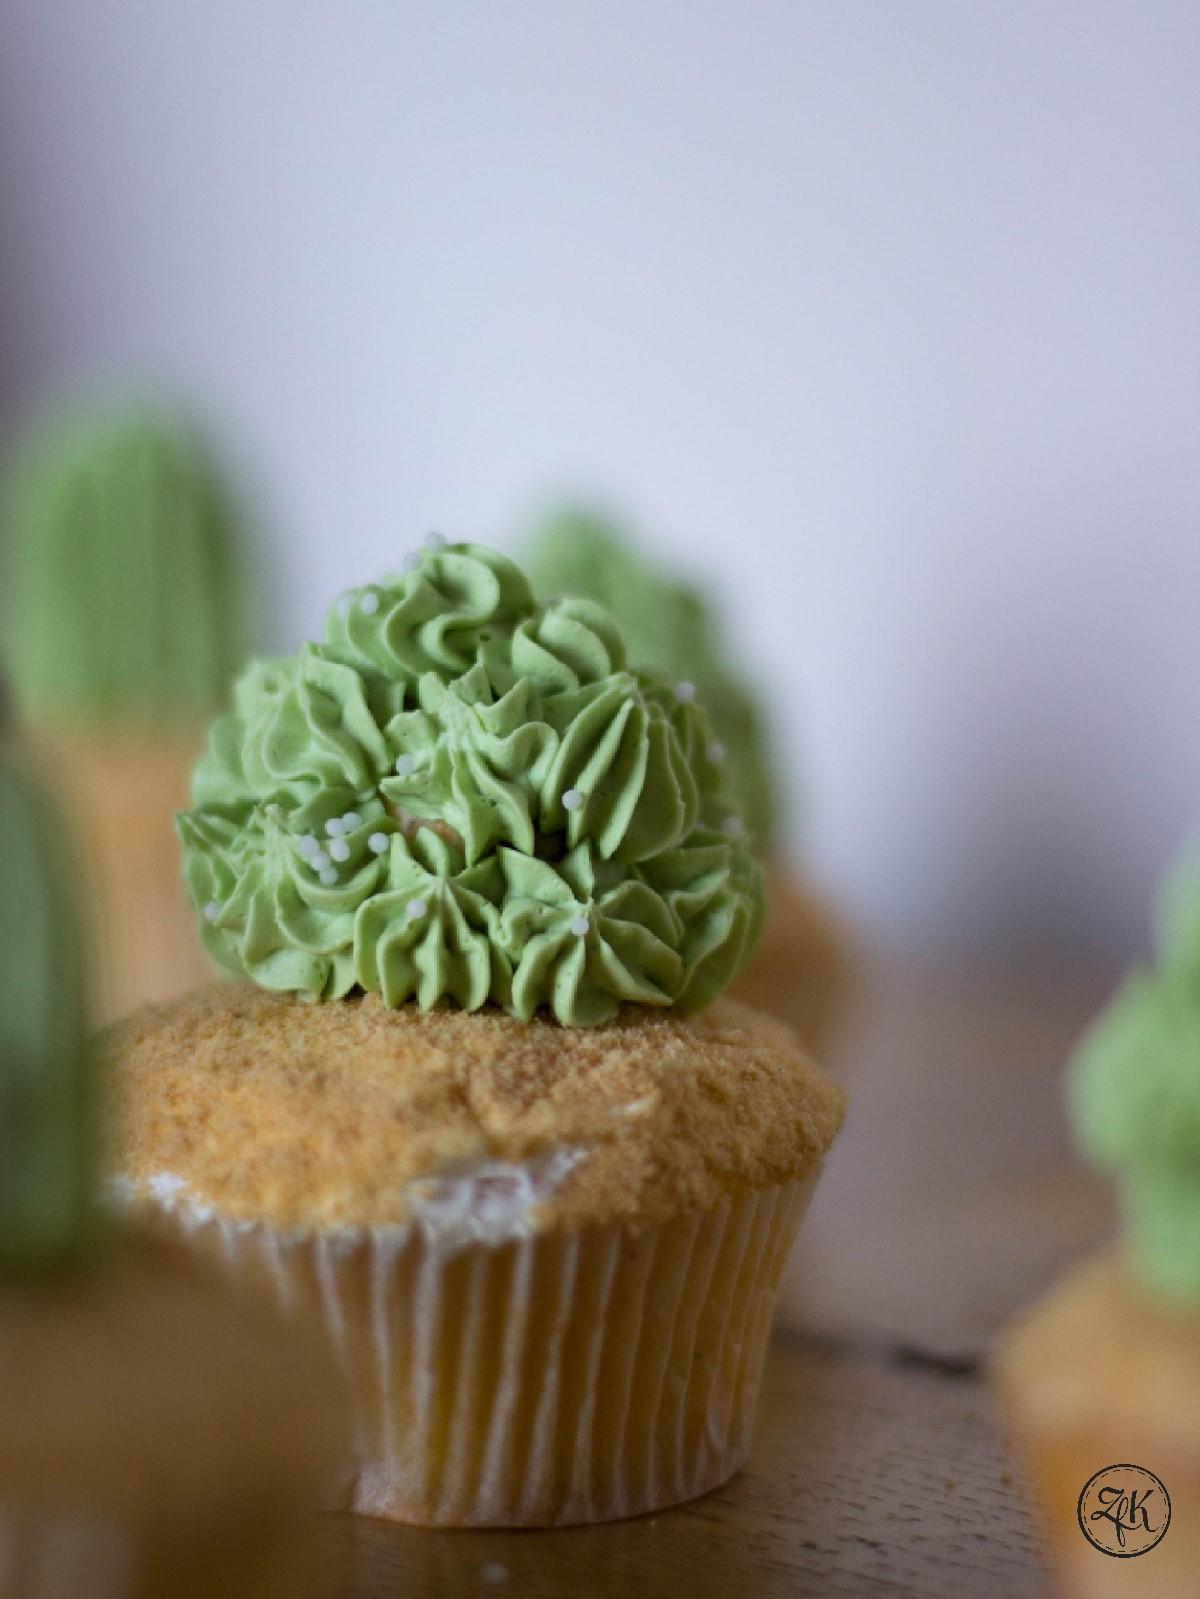 ZfK_Kaktus_Muffins_06